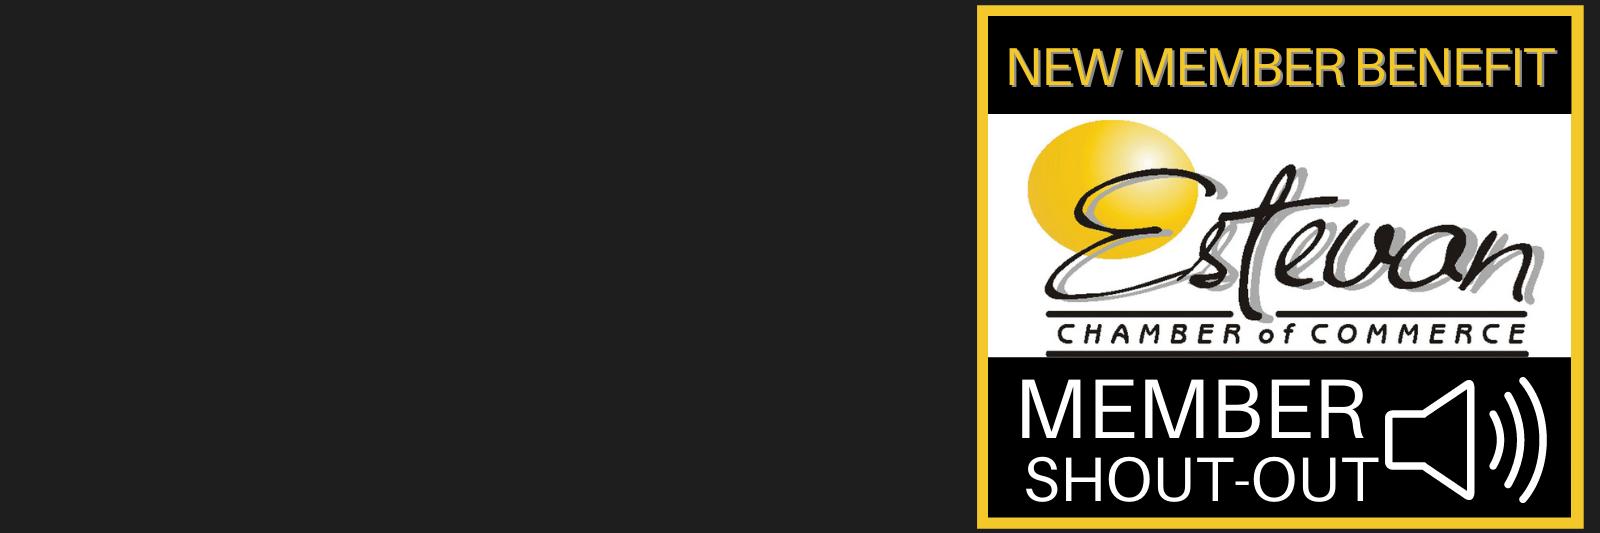 Member-Shout-Out-Website-Banner-2.png